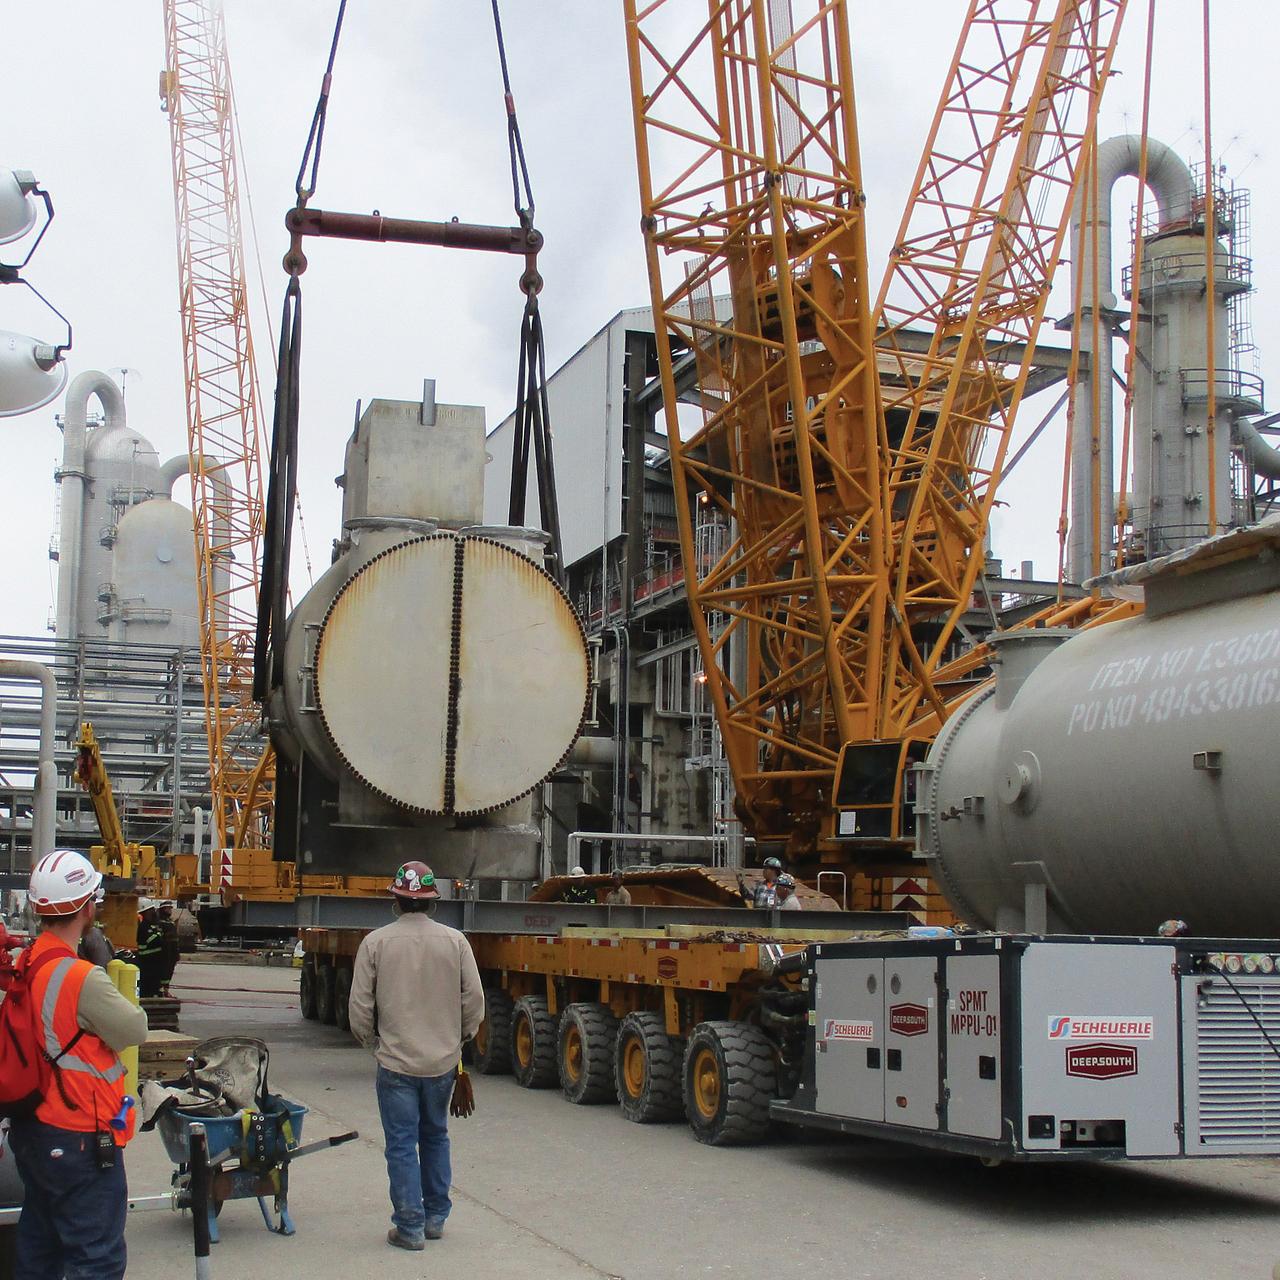 Propylene Compressor Replacement